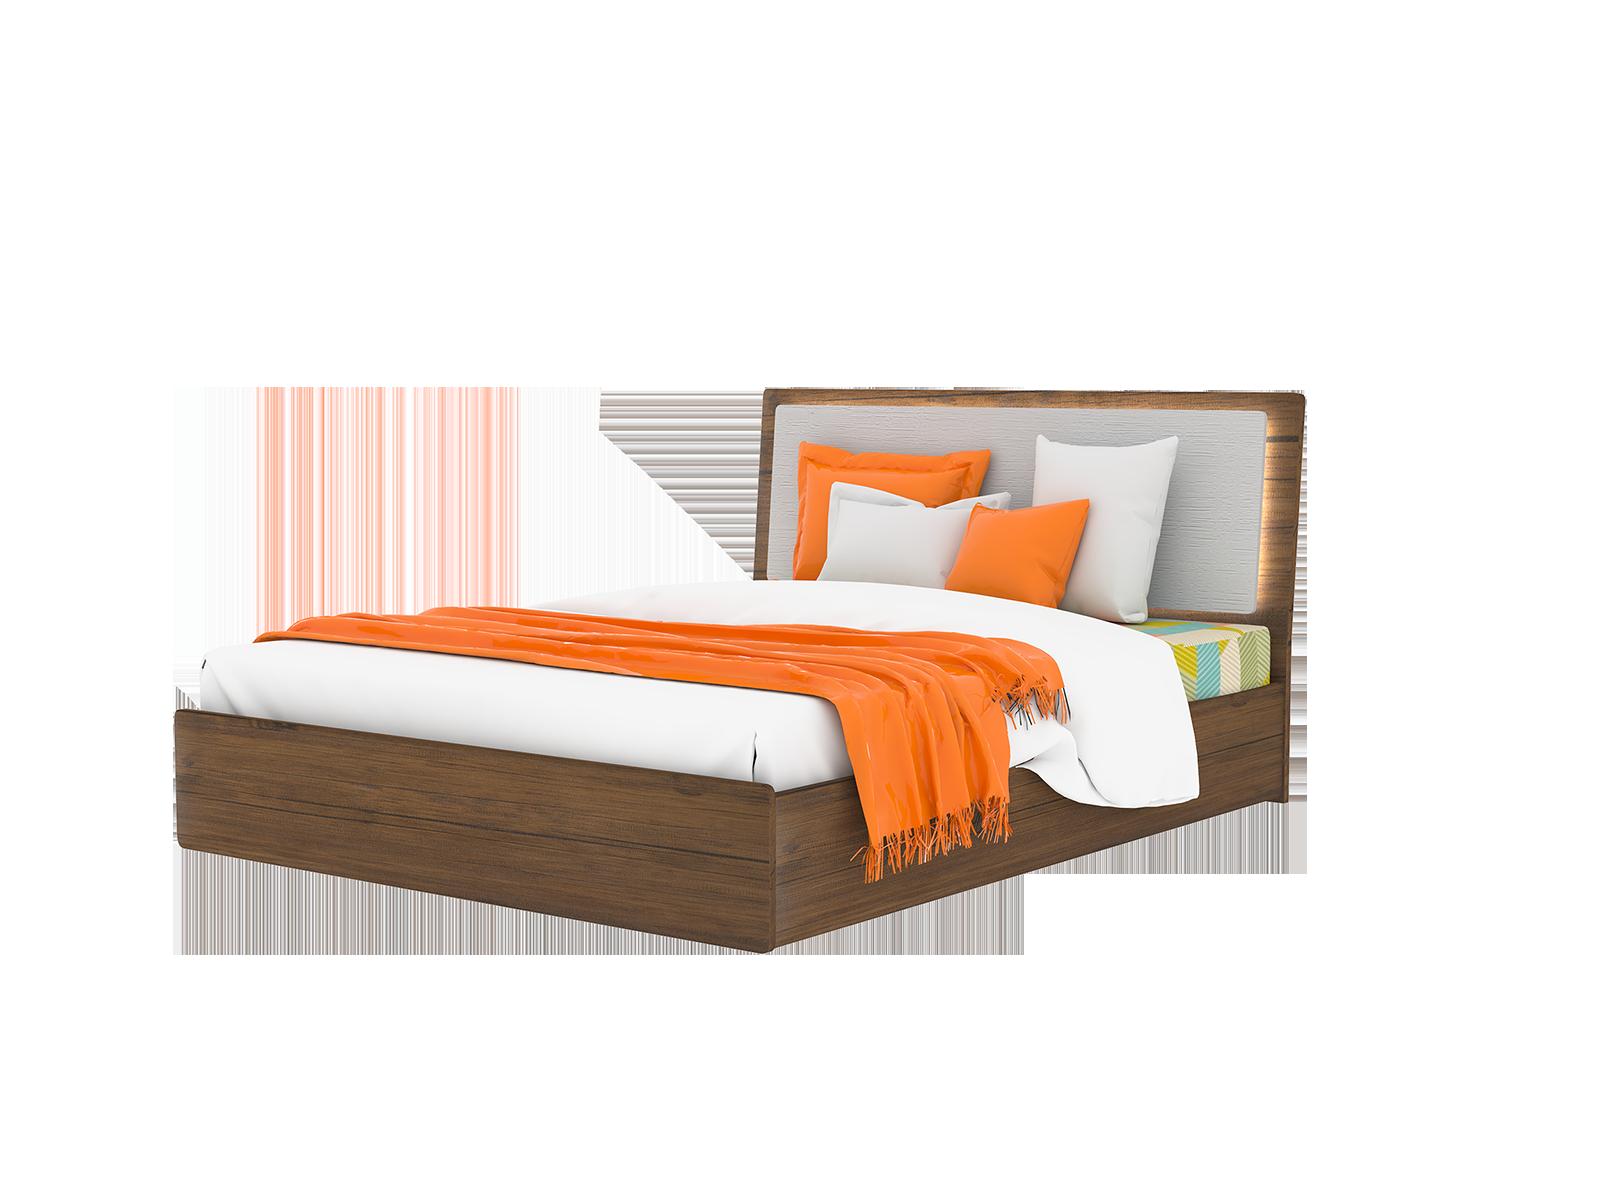 Bed DB-1614